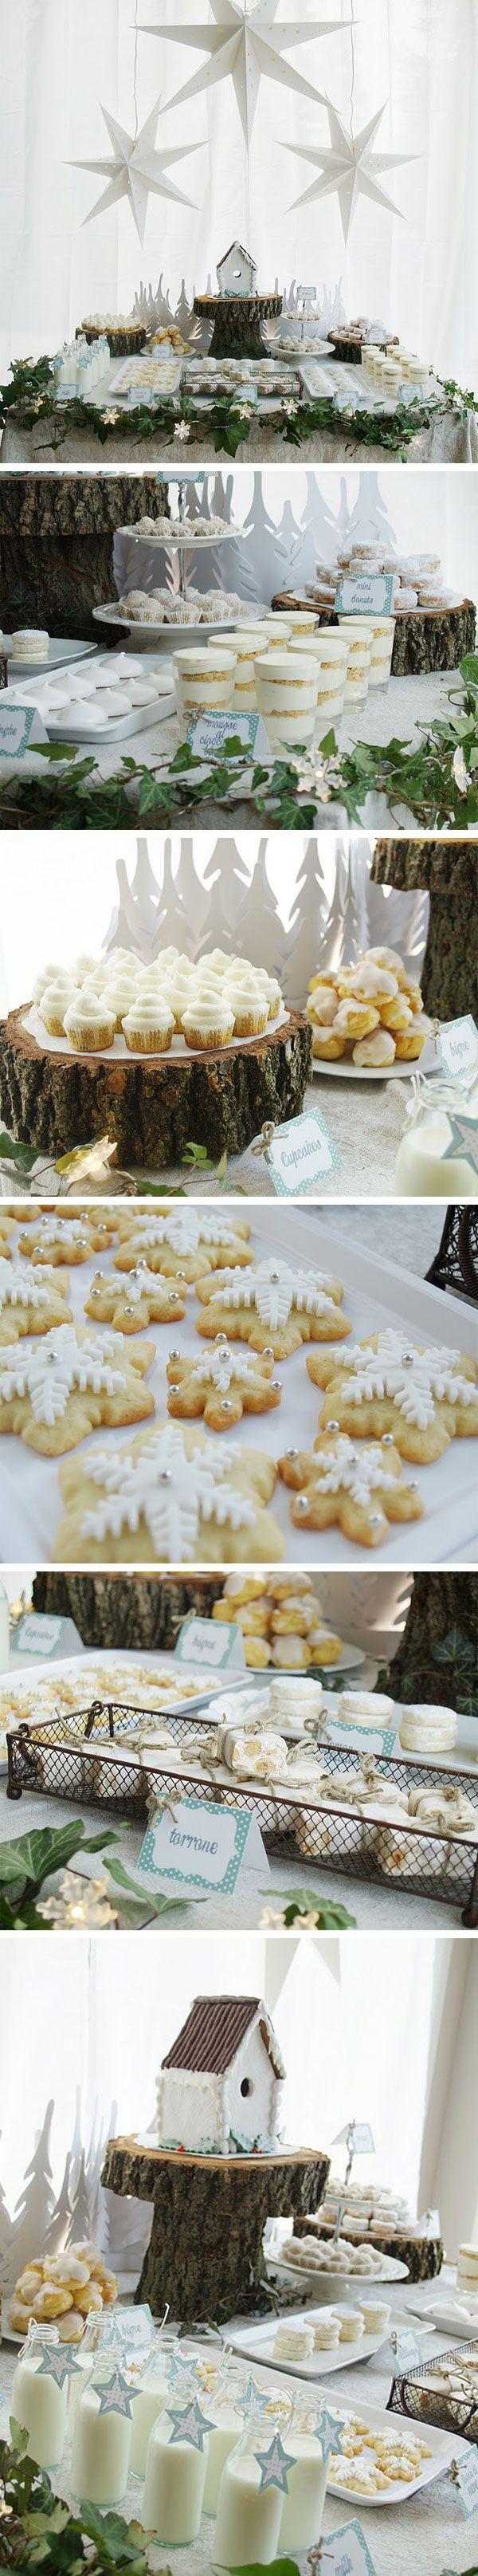 Winter Wonderland Holiday Dessert Table